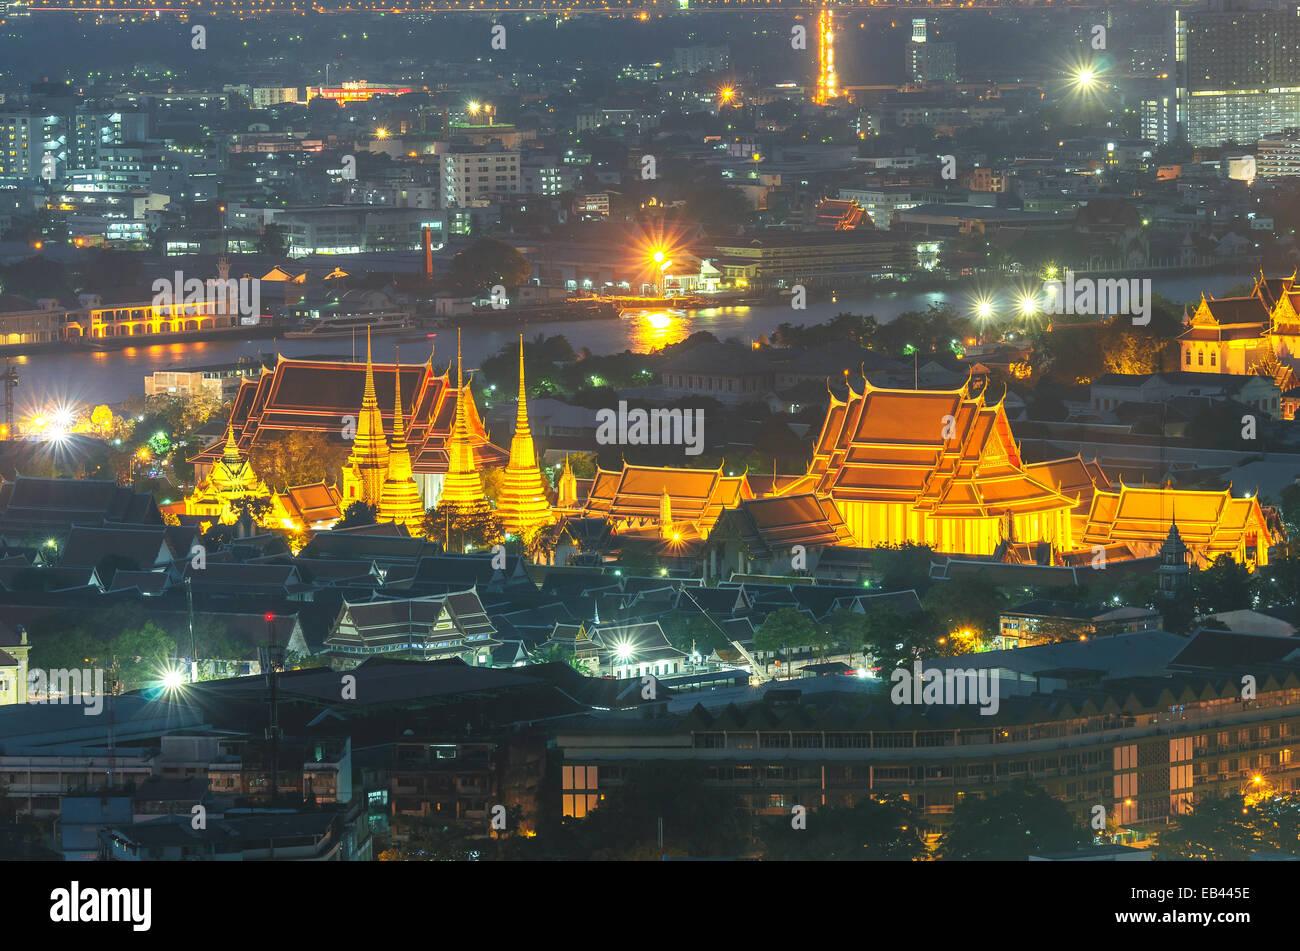 En la penumbra del templo de Wat Pho, Bangkok, Tailandia Imagen De Stock